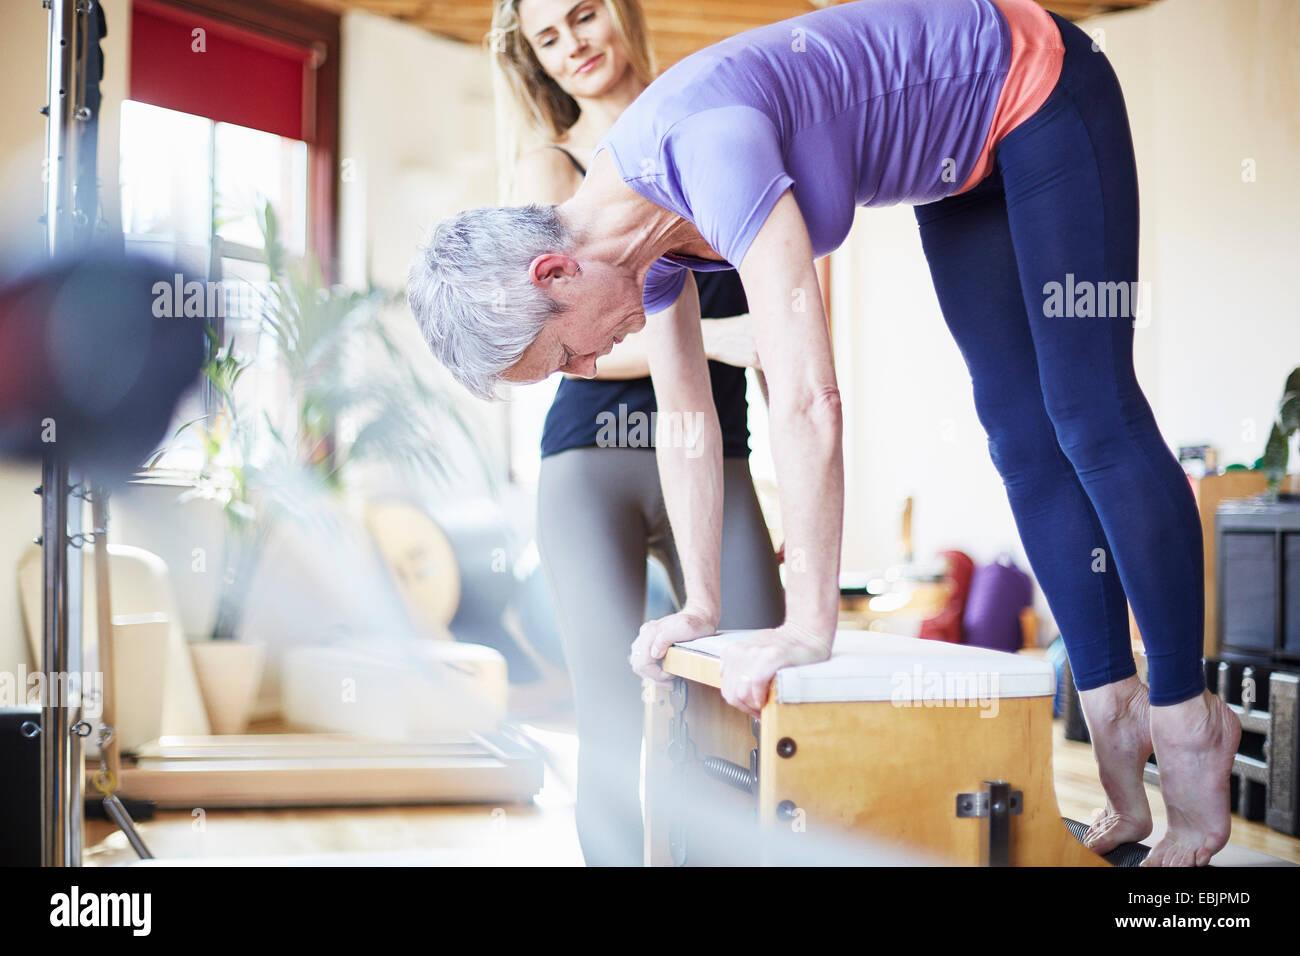 Estudiante de hembras maduras agacharse combo silla de pilates gimnasio Foto de stock